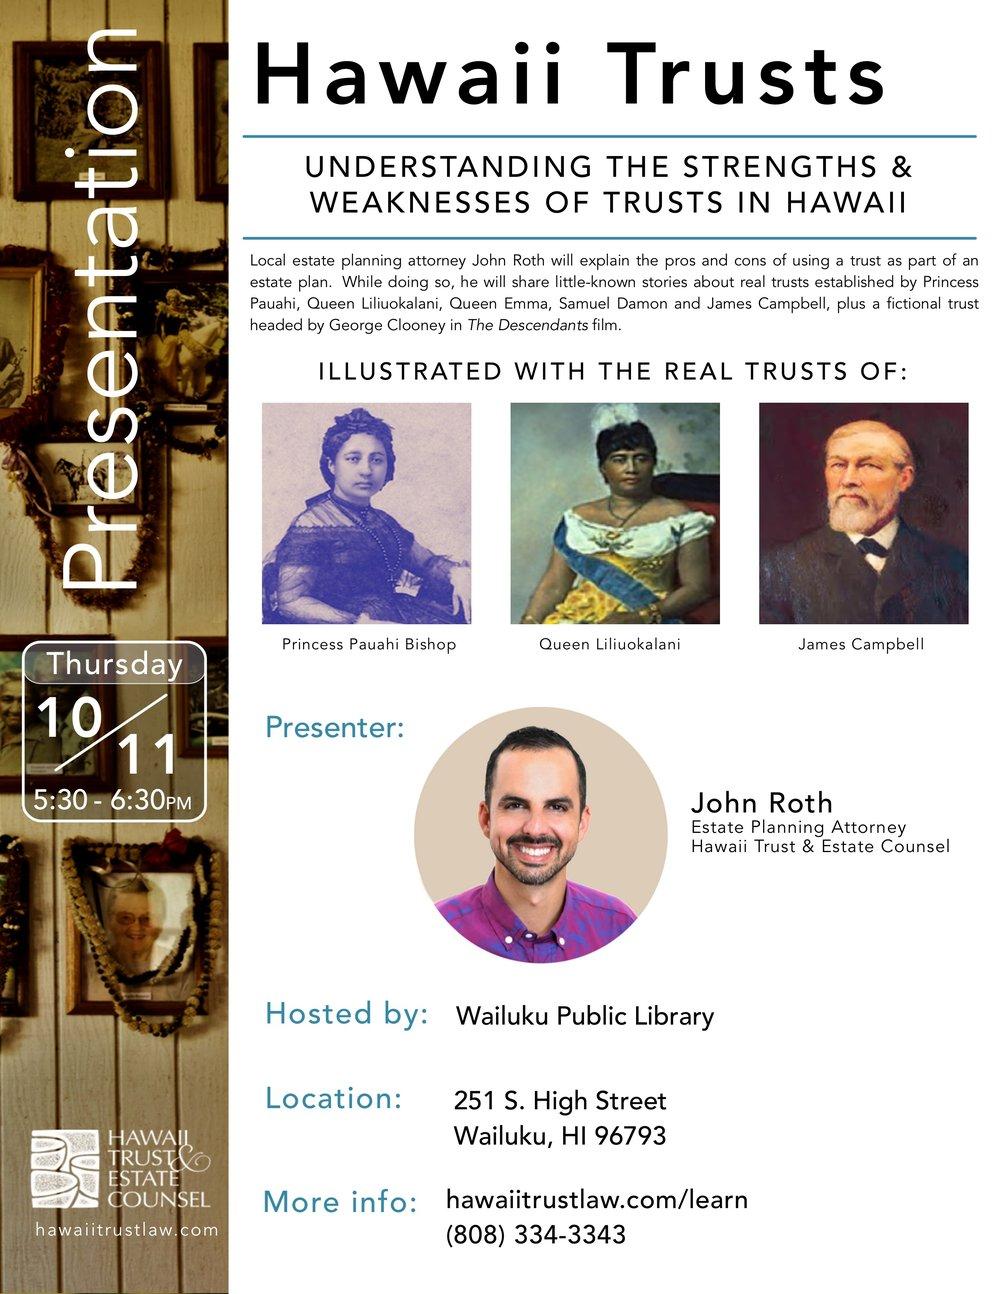 Hawaii Trusts Presentation__Wailuku Maui_Oct 11 2018_Flyer_HTEC .jpg